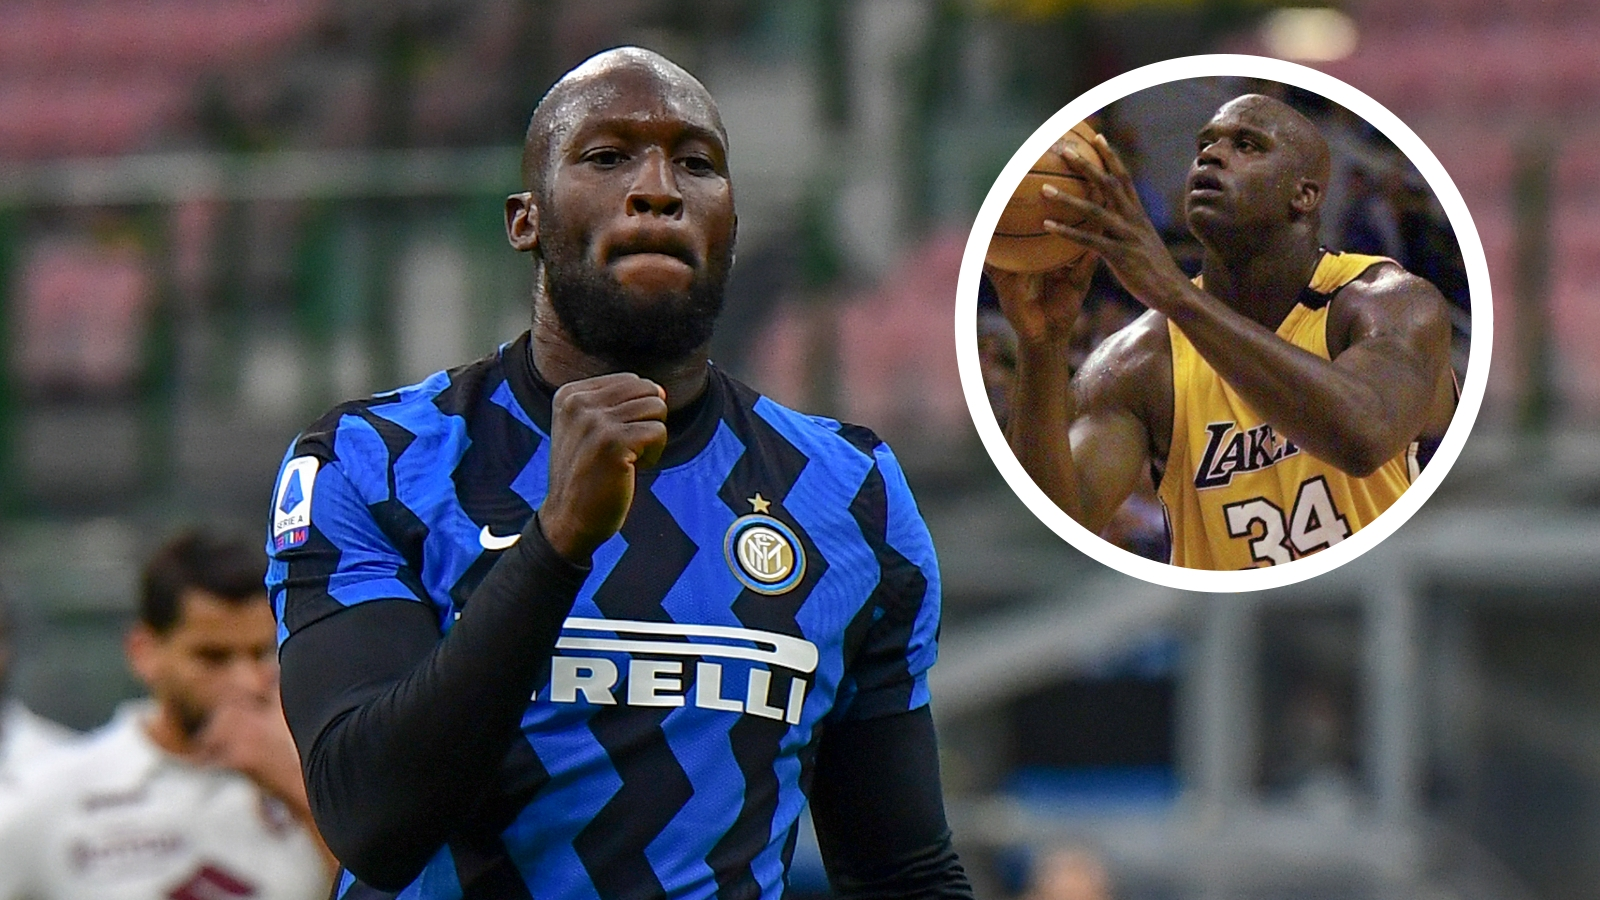 'Lukaku is like Shaq, a force of nature!' – Inter striker lauded by Barella